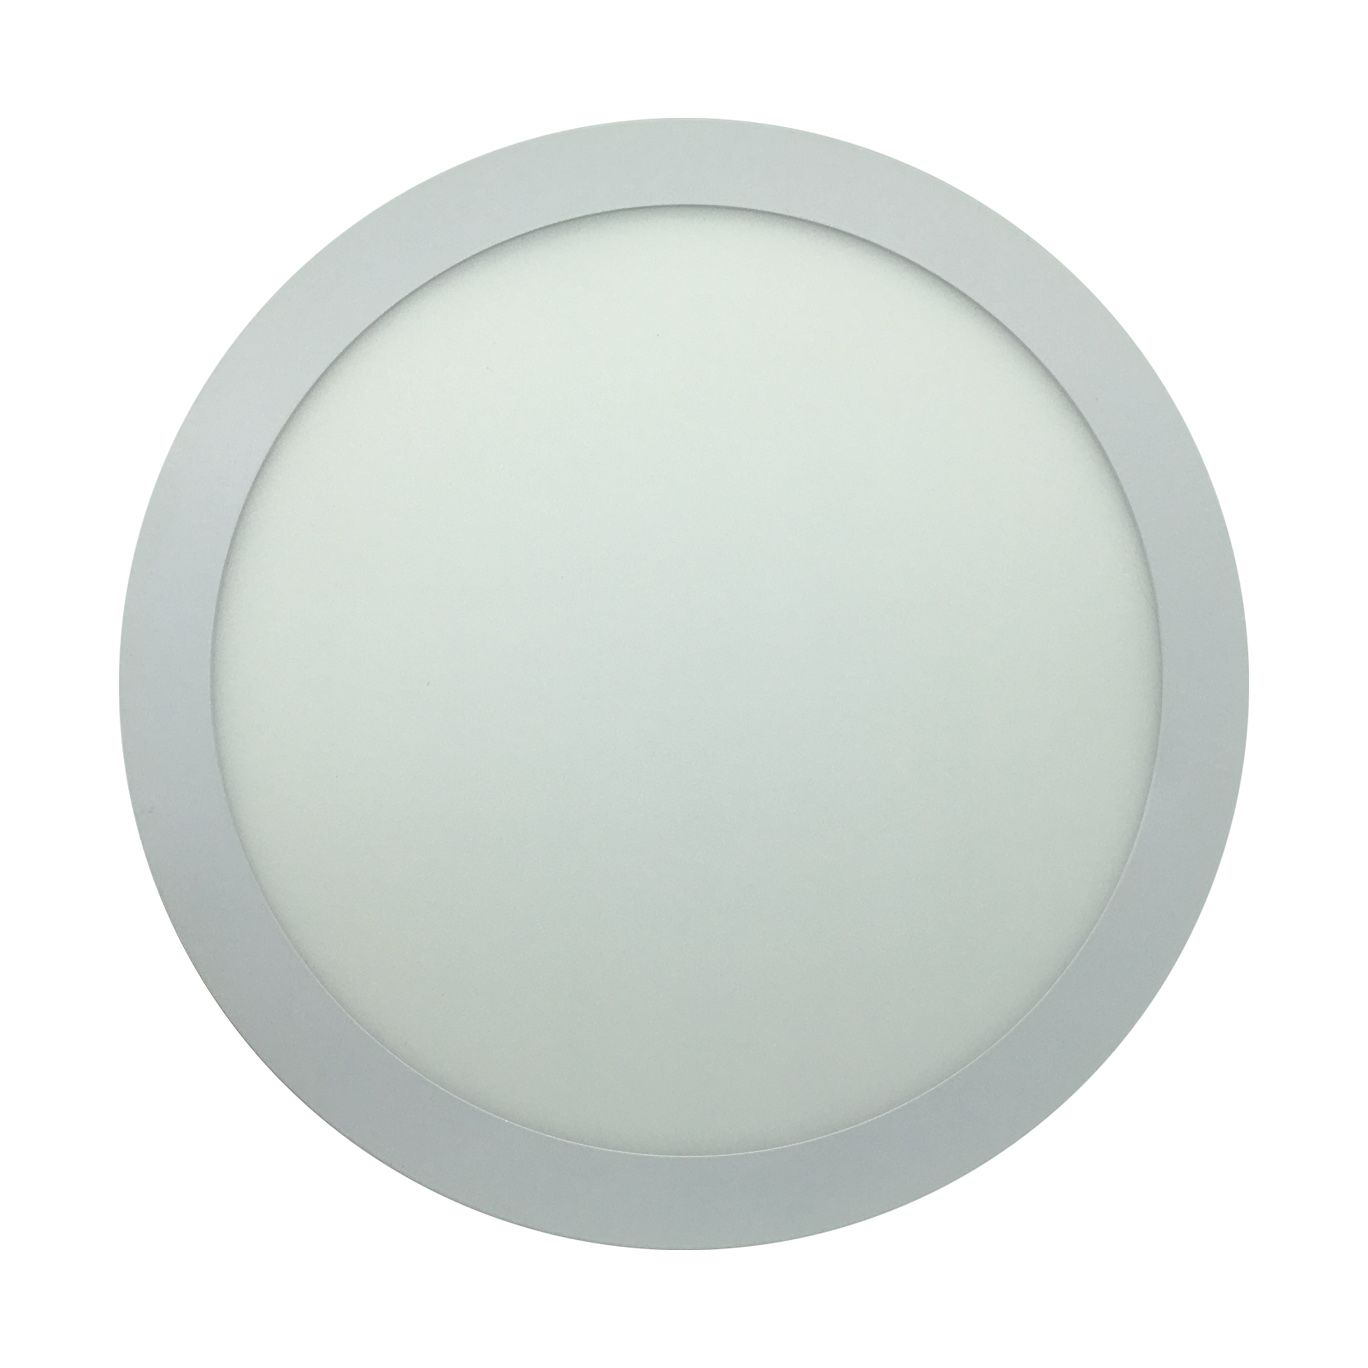 Painel de LED Embutir Redonda 3000K - 24W